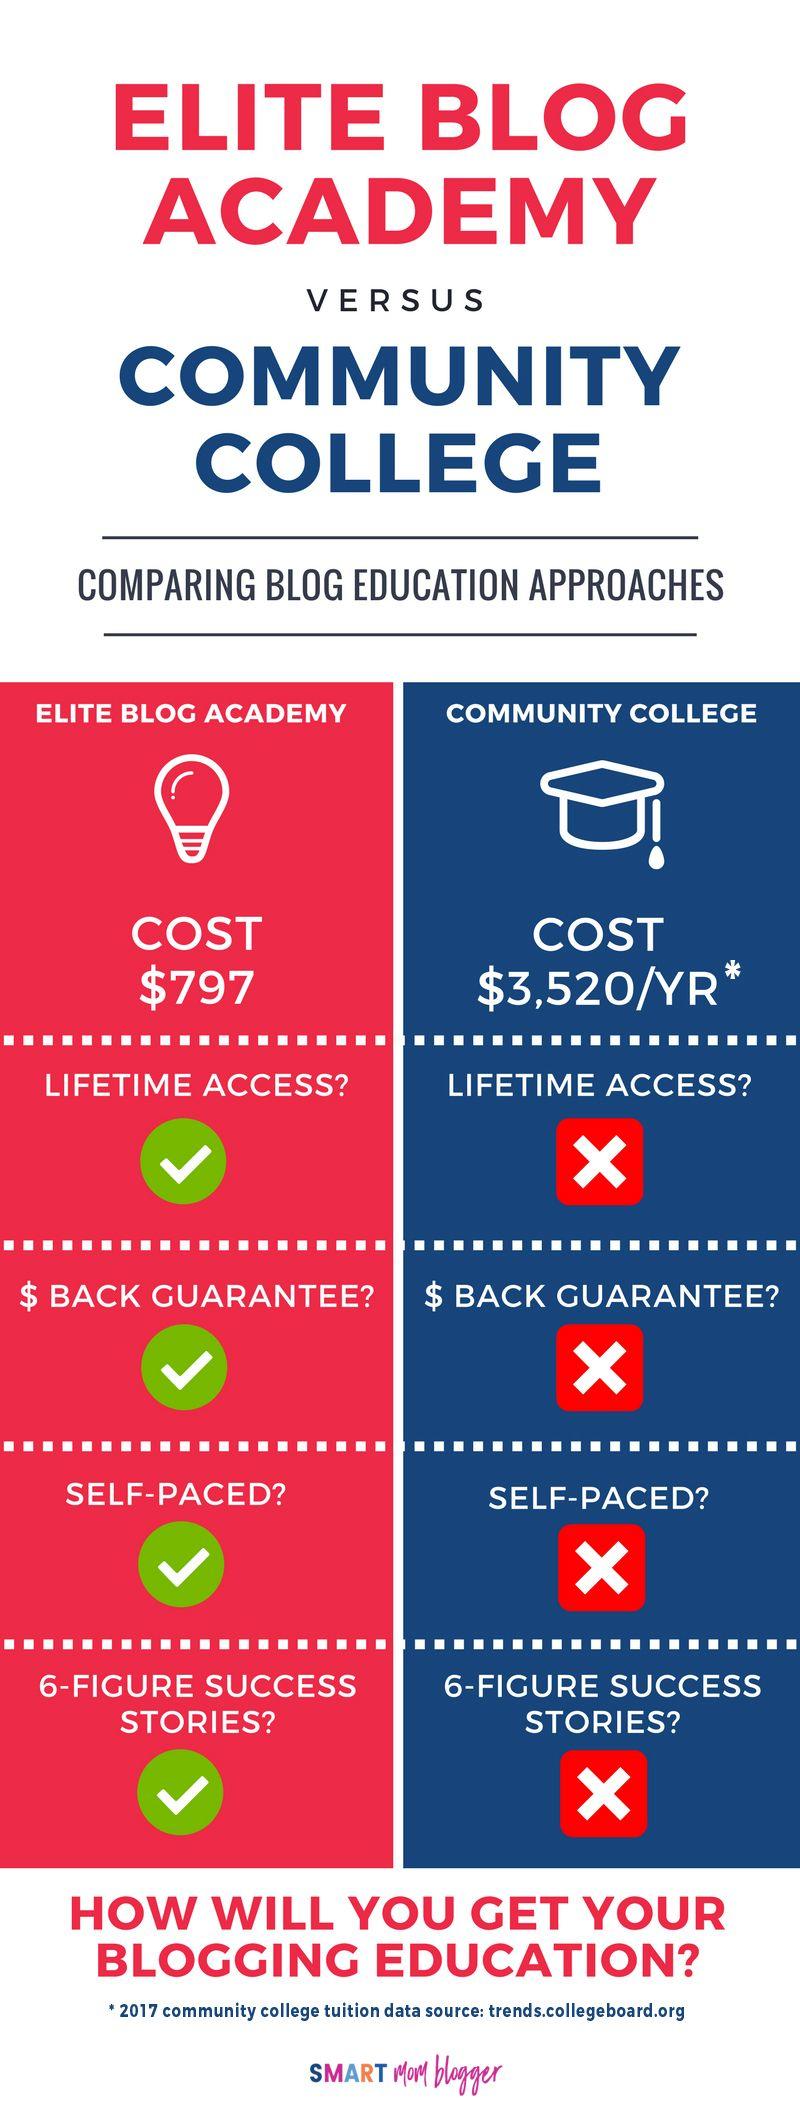 3.0 Elite blog academy, Learn blogging, Education blog